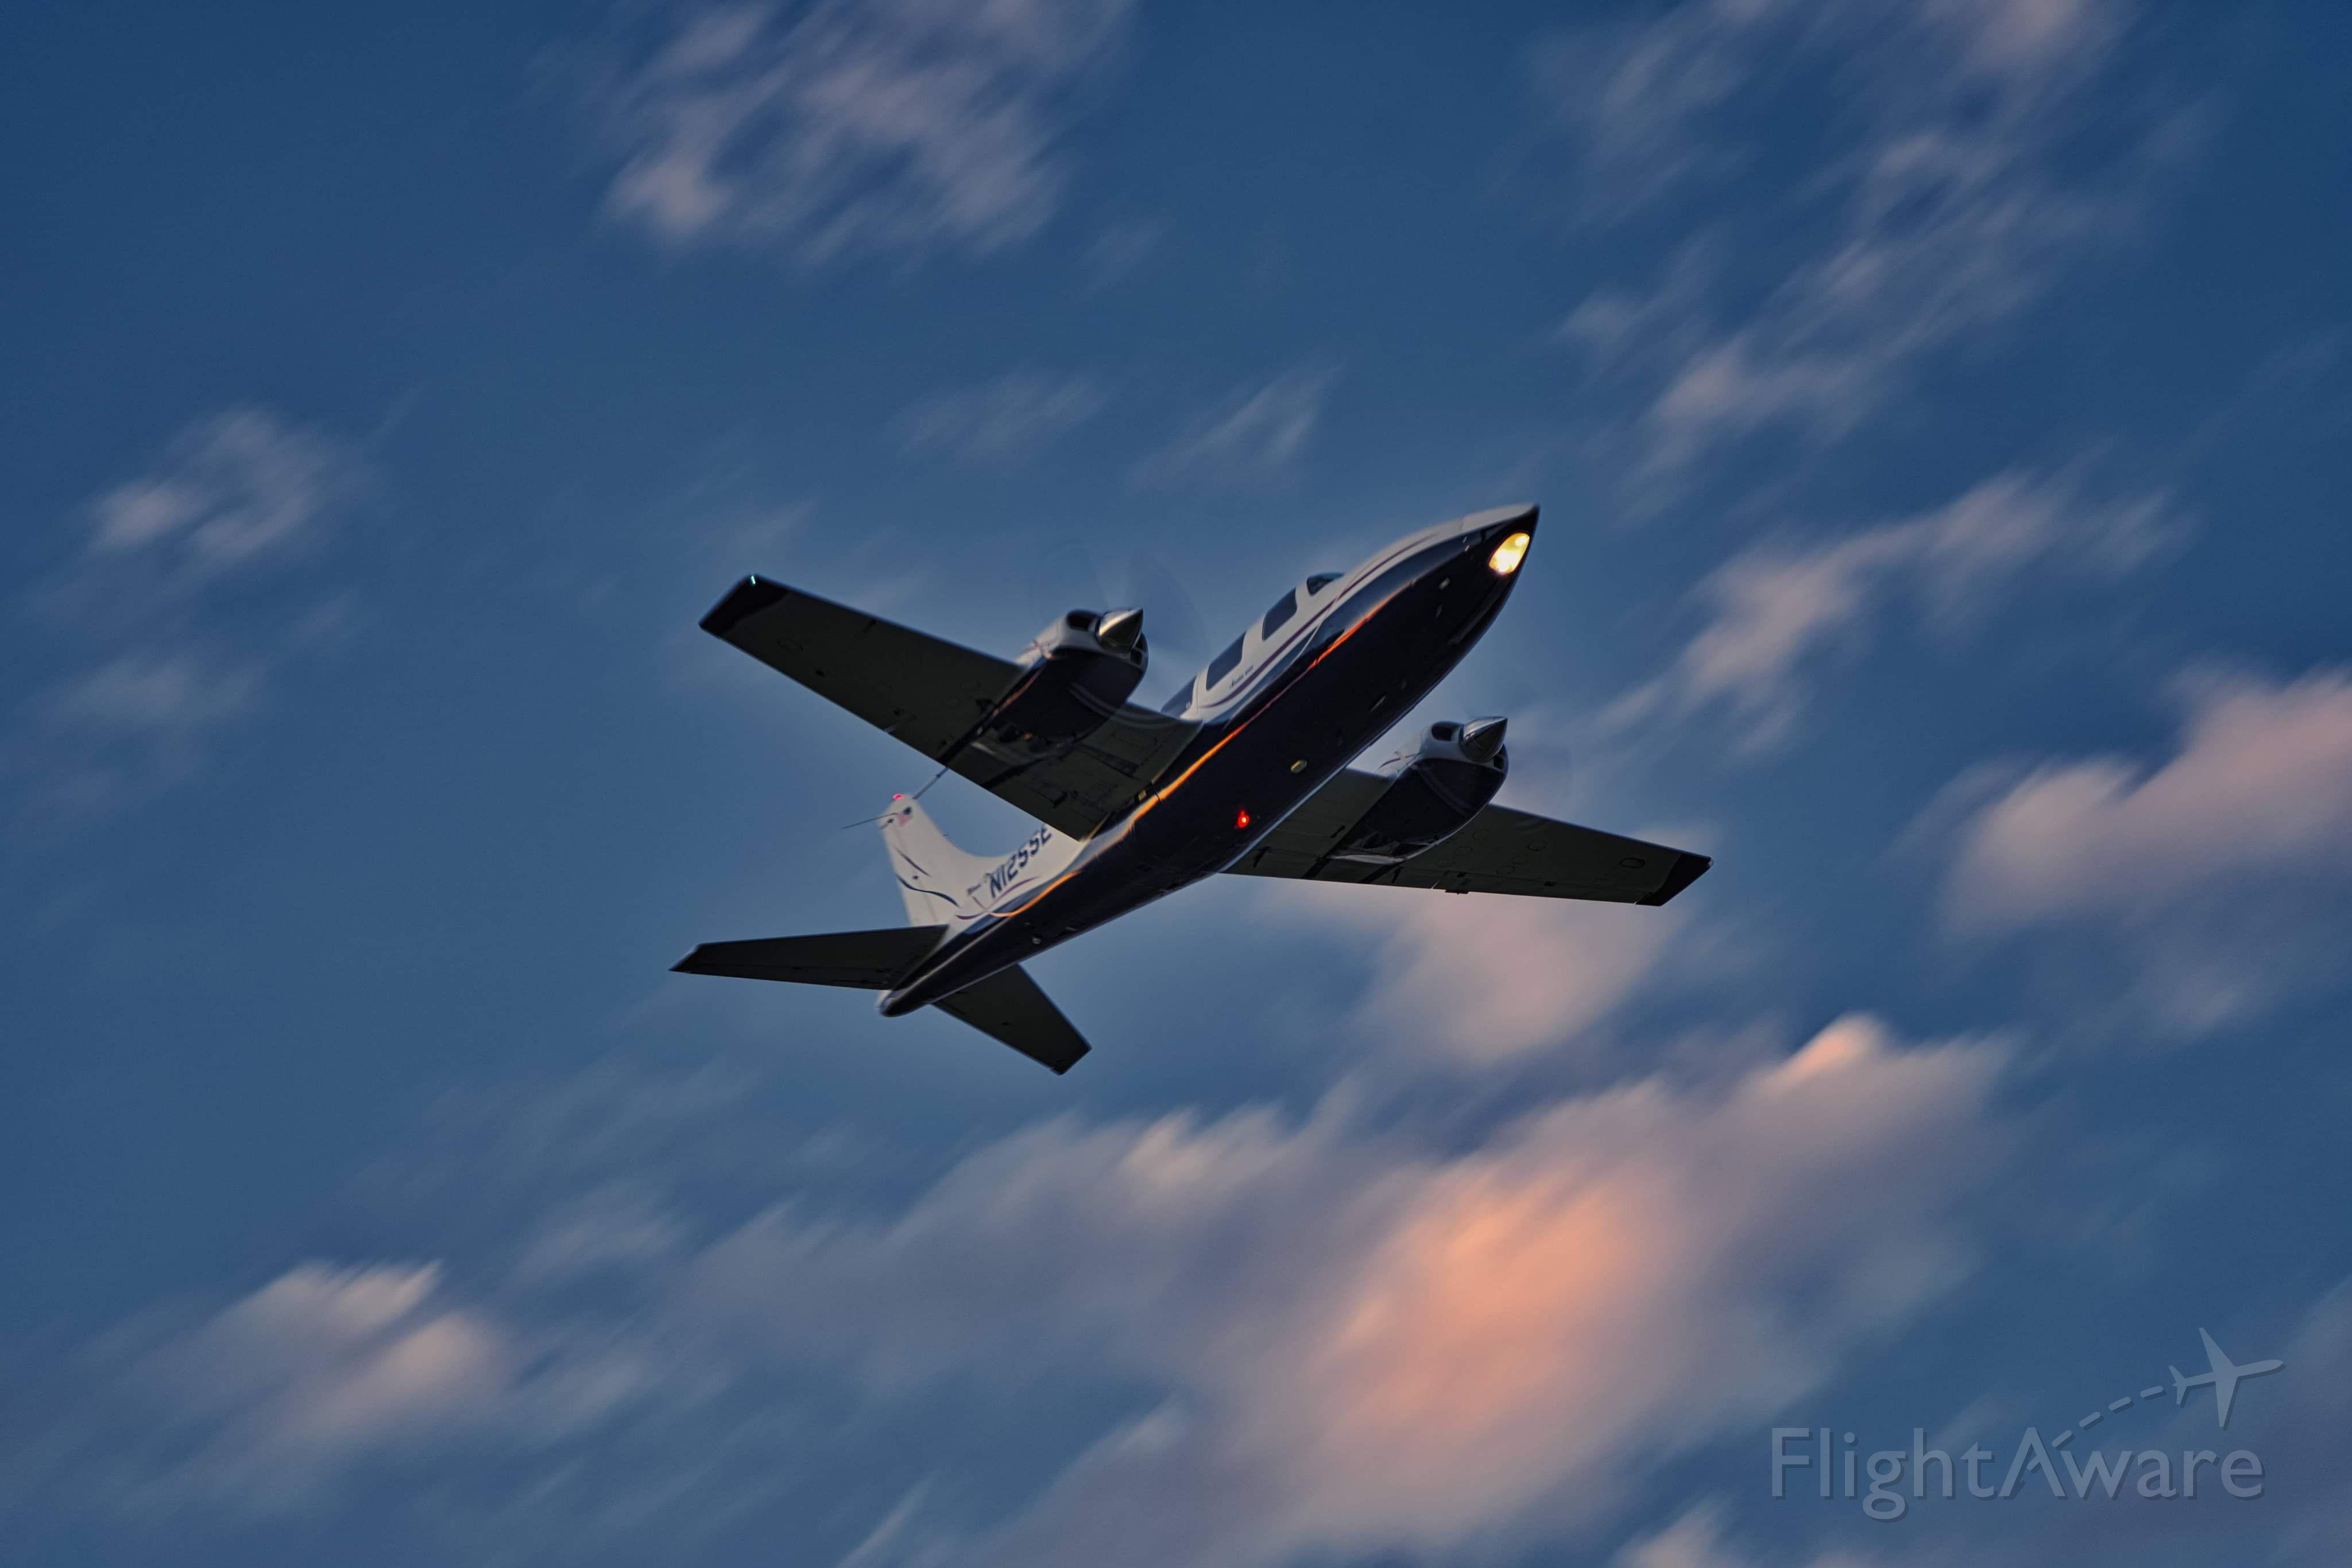 Piper Aerostar (N125SE) - The Wind Dancer fly by.